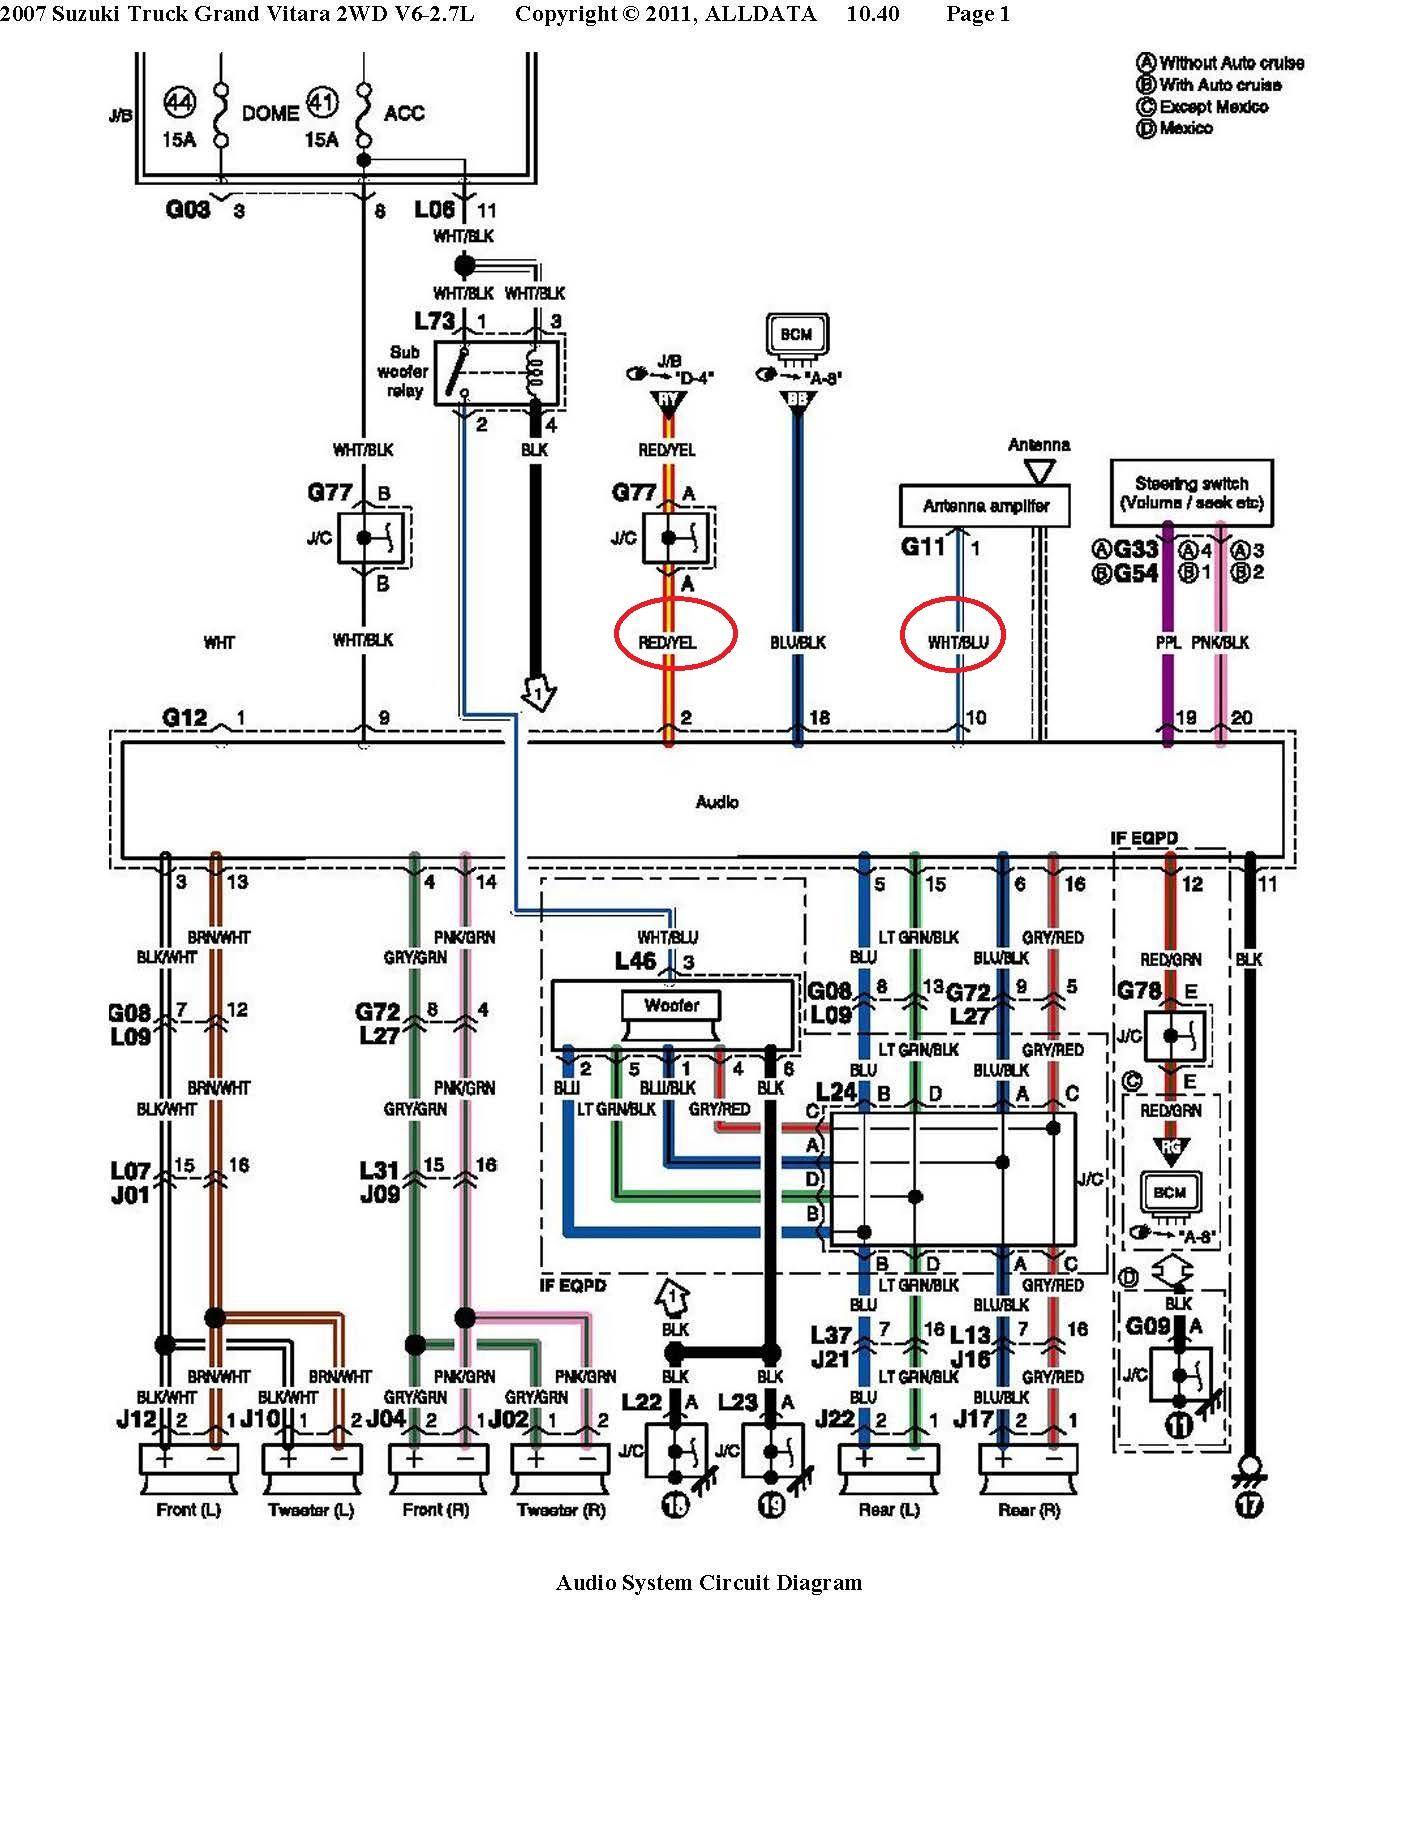 clarion stereo wiring diagram suzuki grand vitara auto electrical pioneer stereo  wiring colors clarion stereo wiring